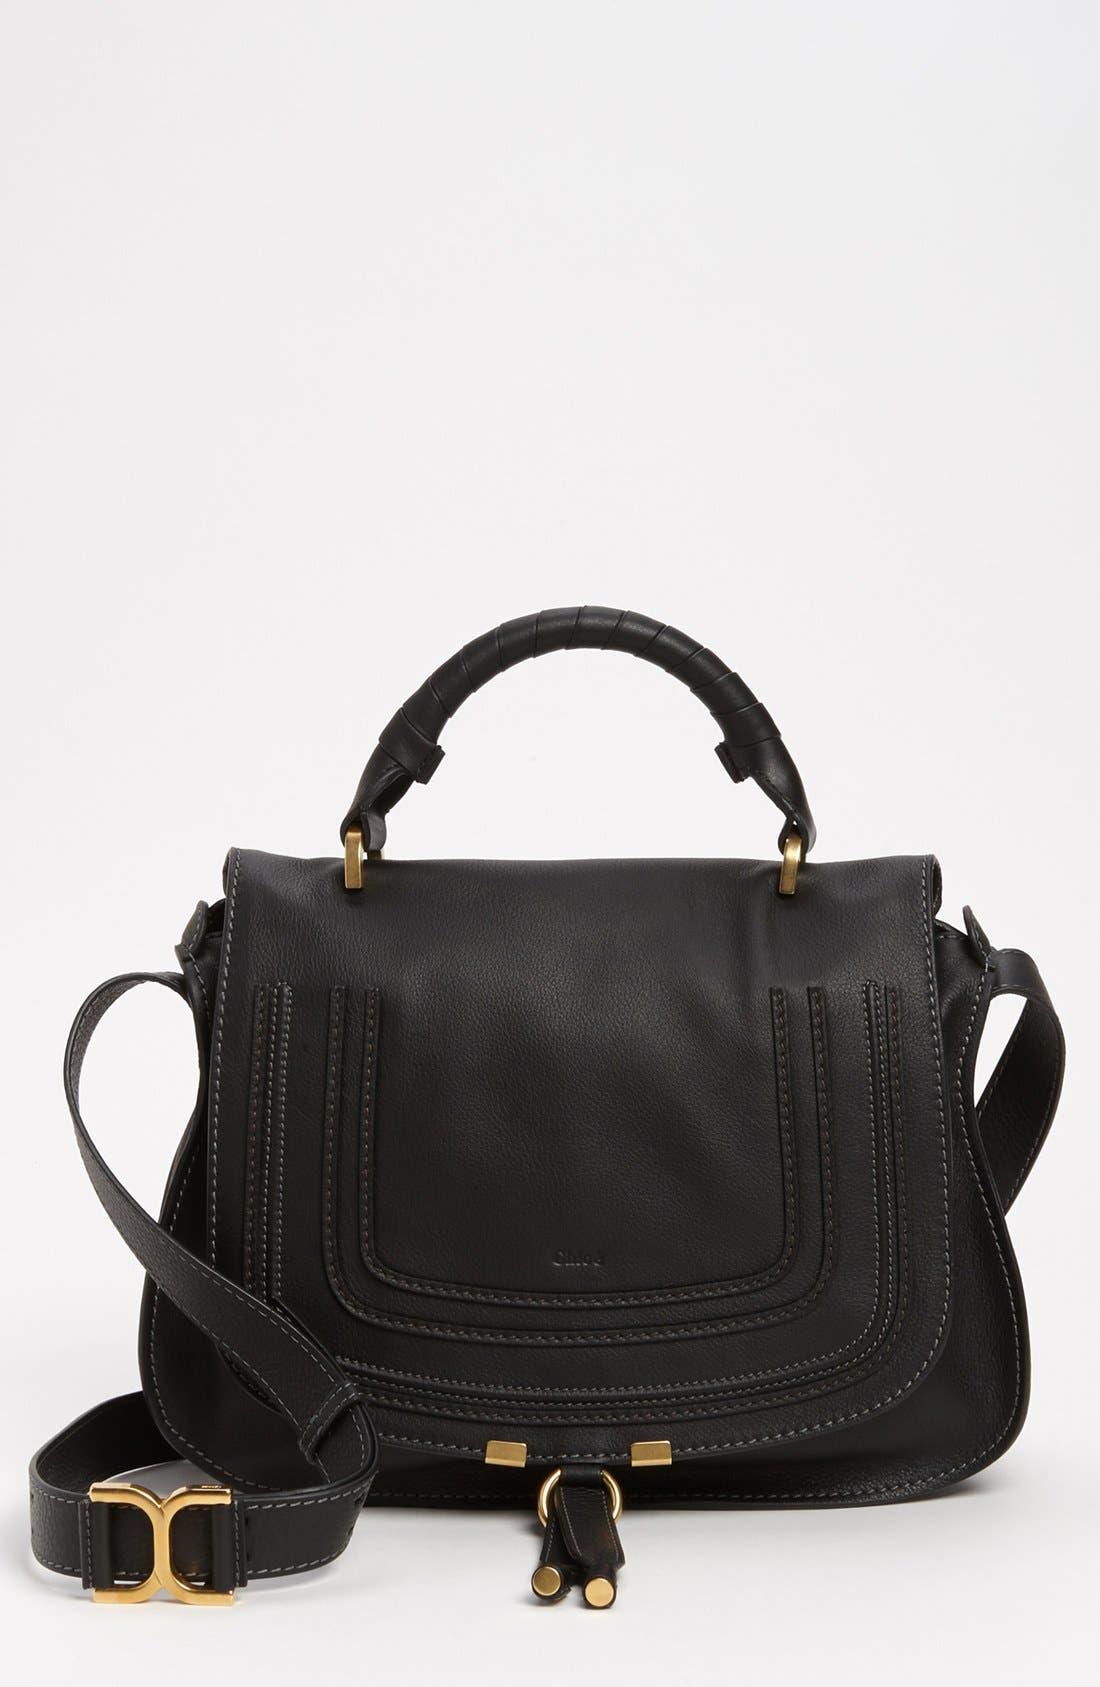 Alternate Image 1 Selected - Chloé 'Marcie' Top Handle Leather Satchel